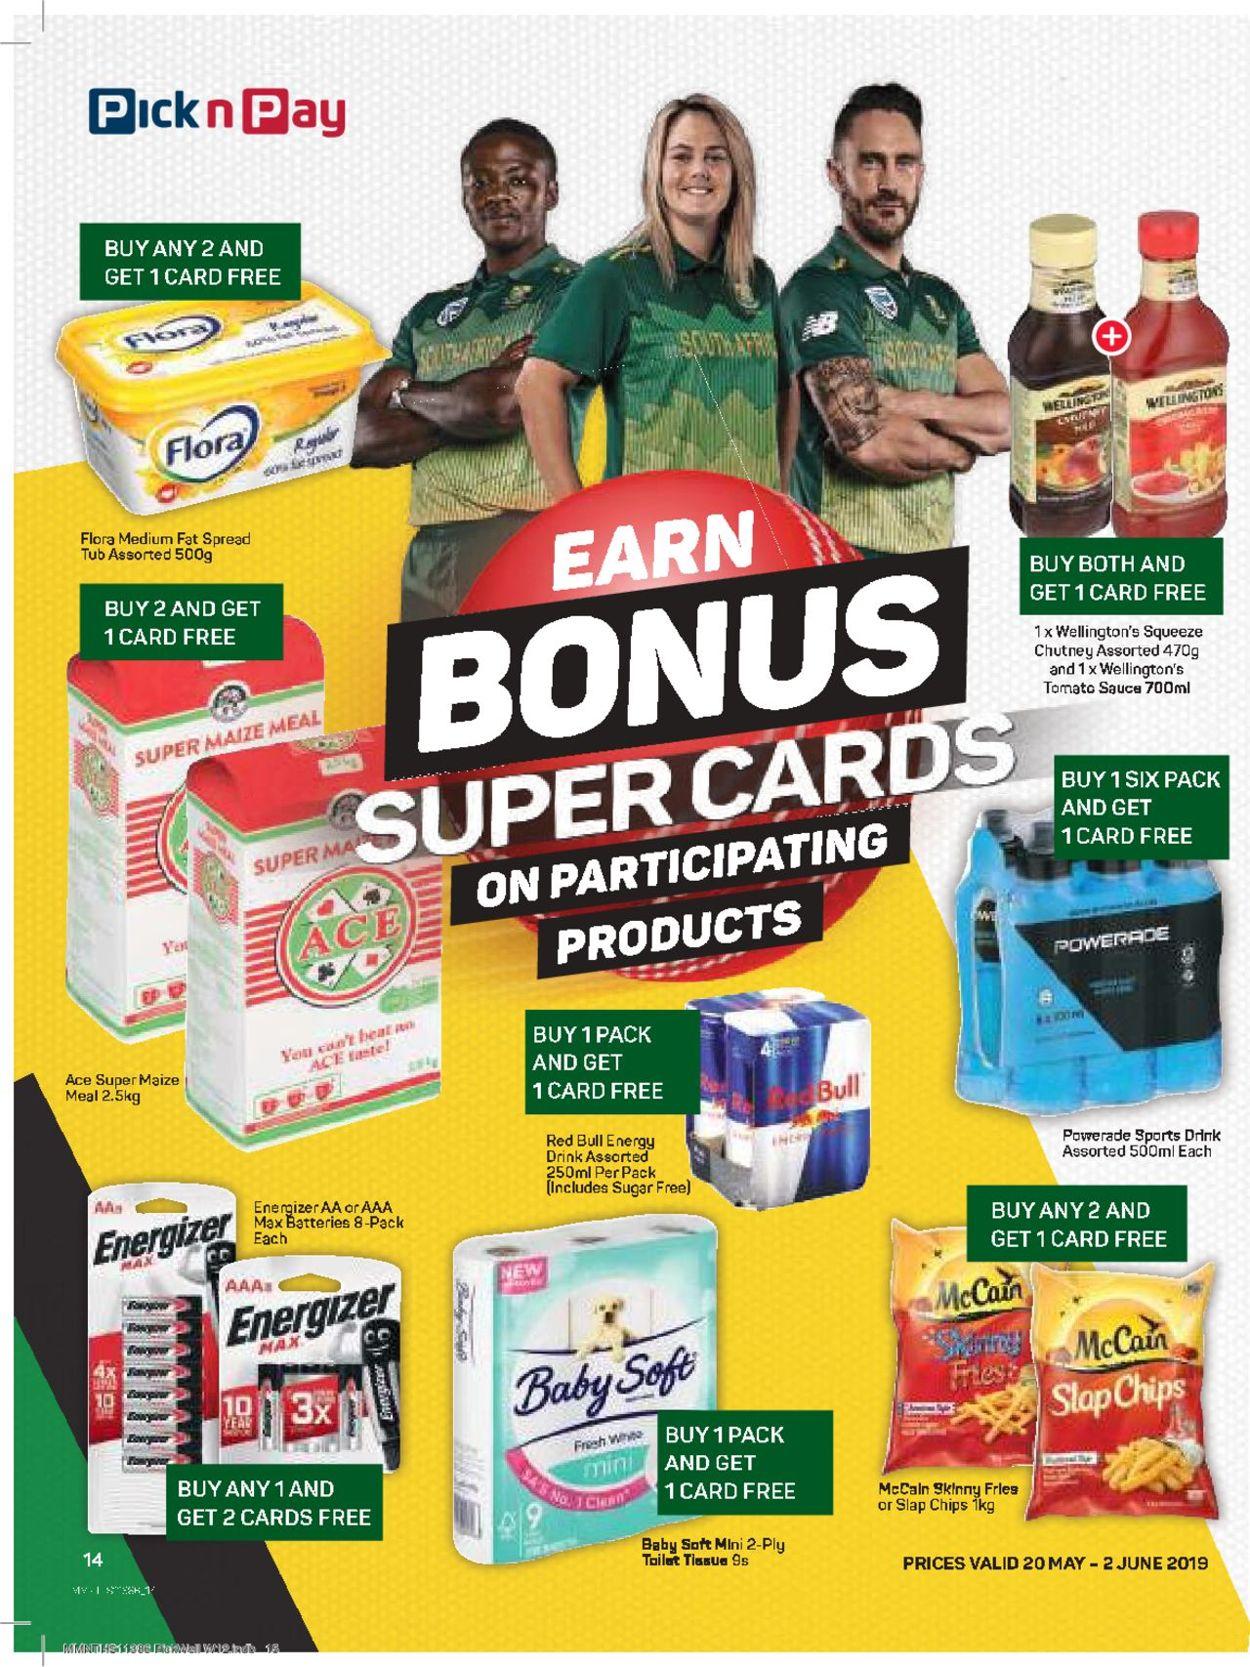 Pick n Pay Catalogue - 2019/05/20-2019/06/02